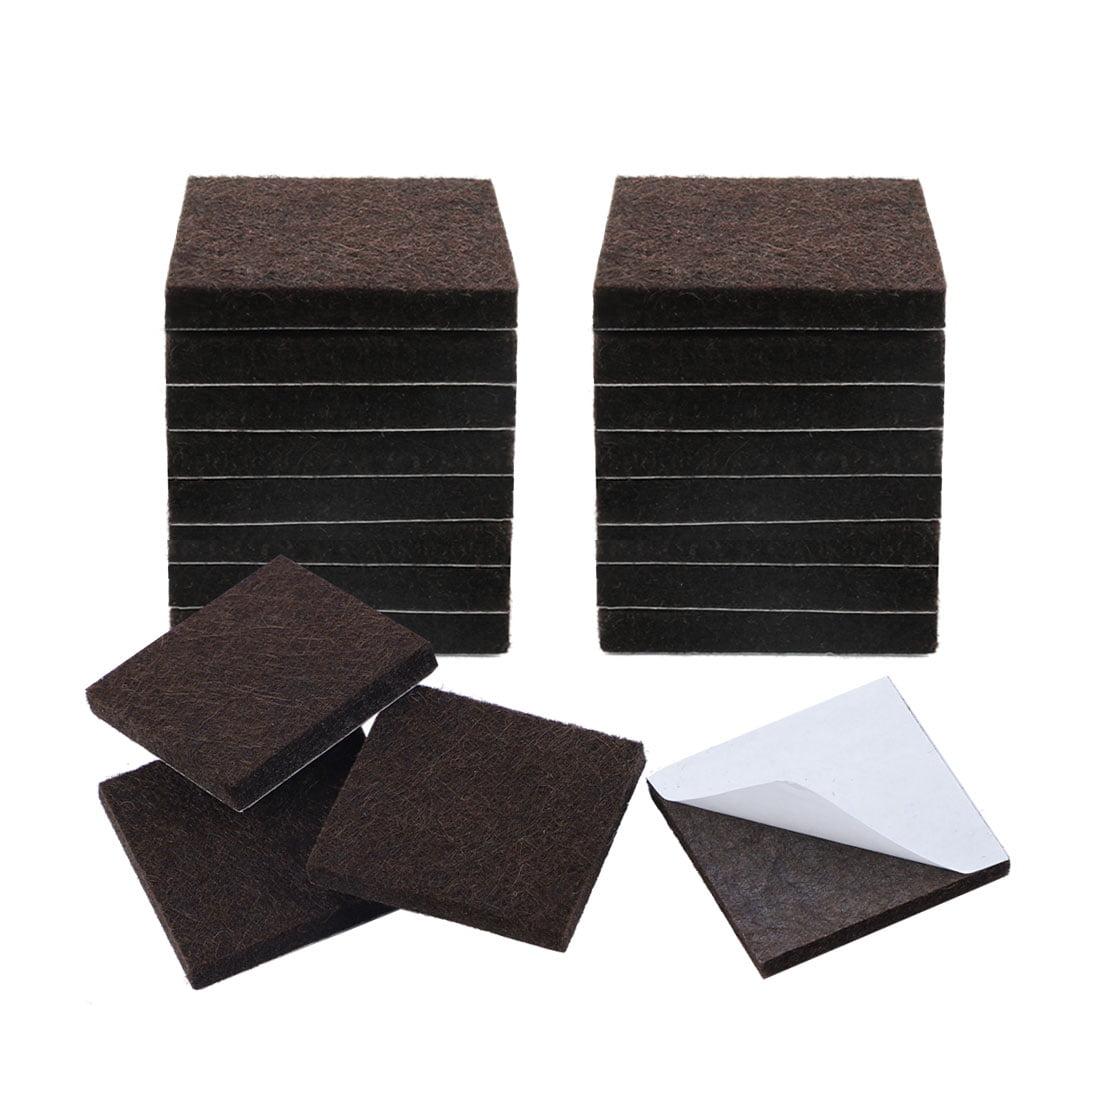 20PCS 1 Inch Square Chair Leg Floor Protectorss Wool Felt Furniture Pad Silicone